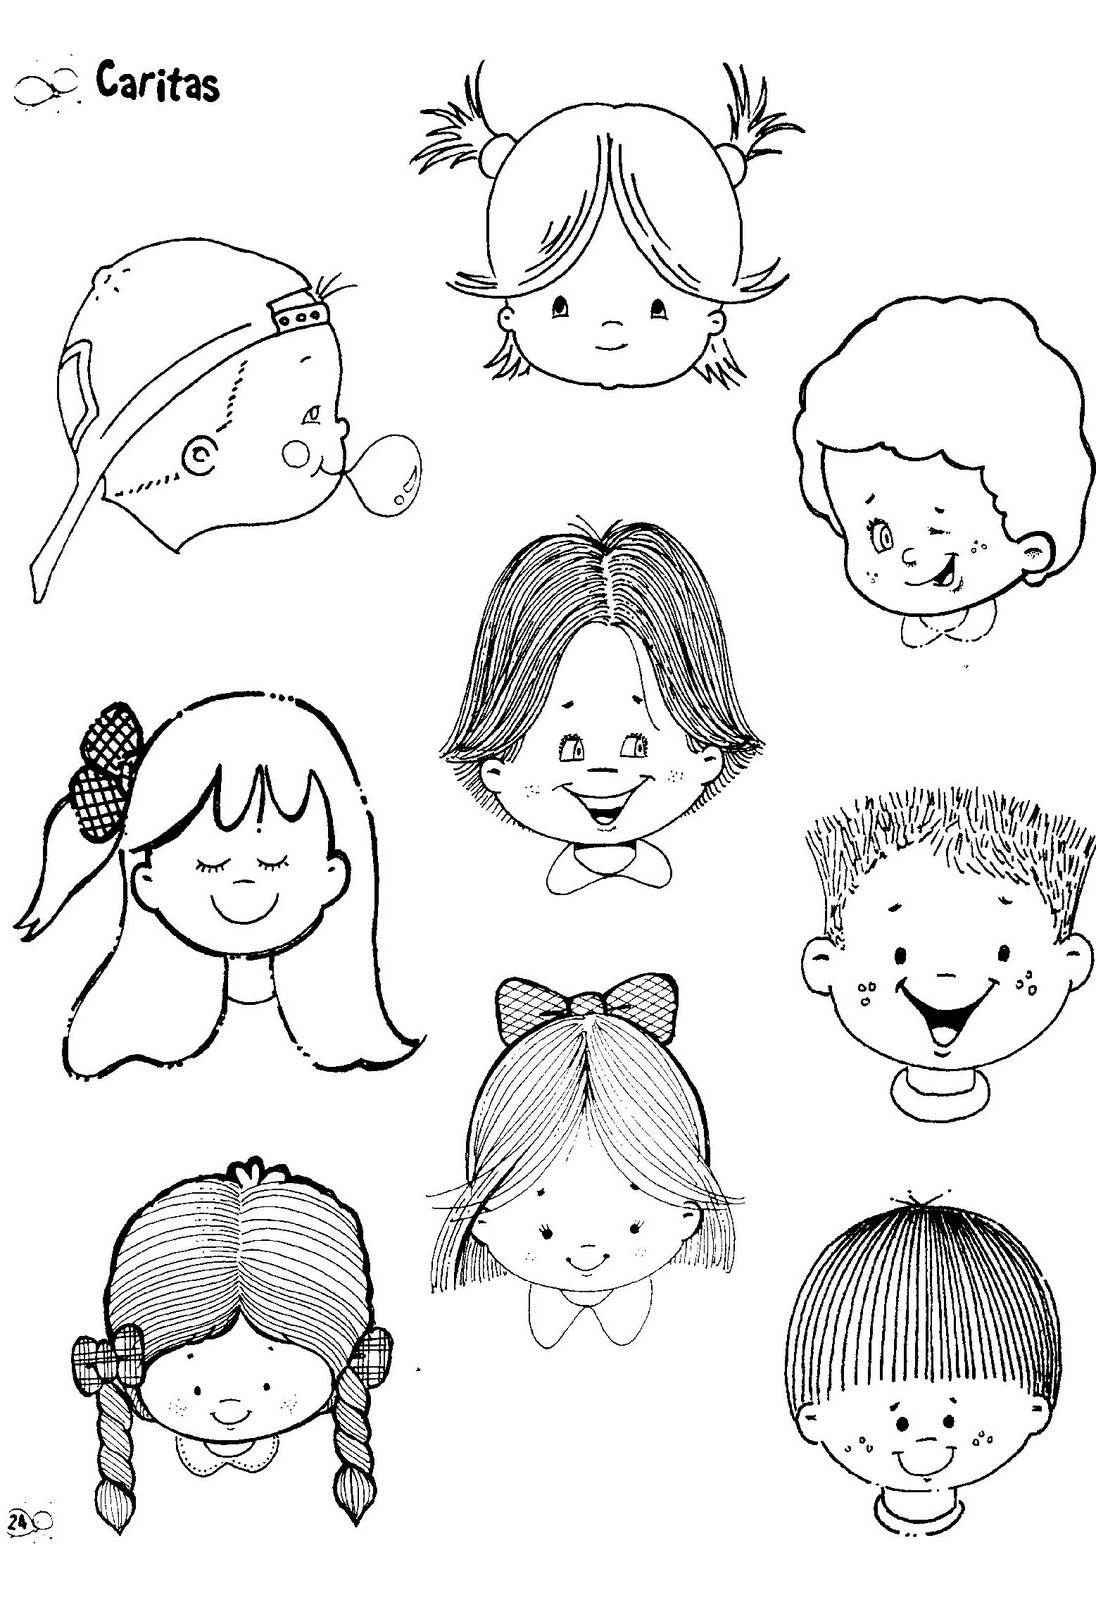 Fichas para infantil y primaria: Caras para colorea e imprimir